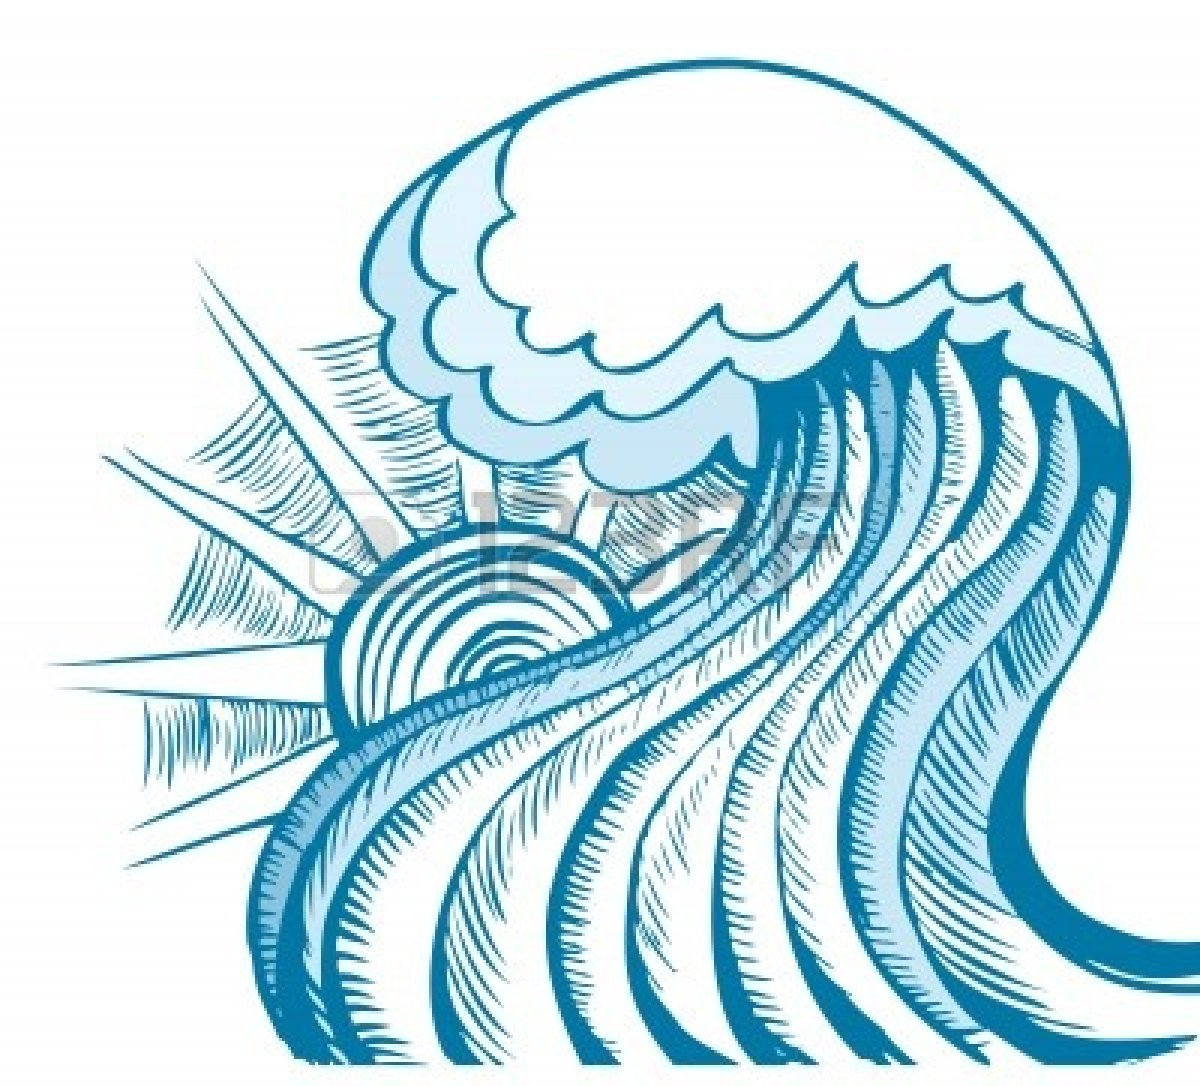 Waves clipart tide. Free tidal wave download